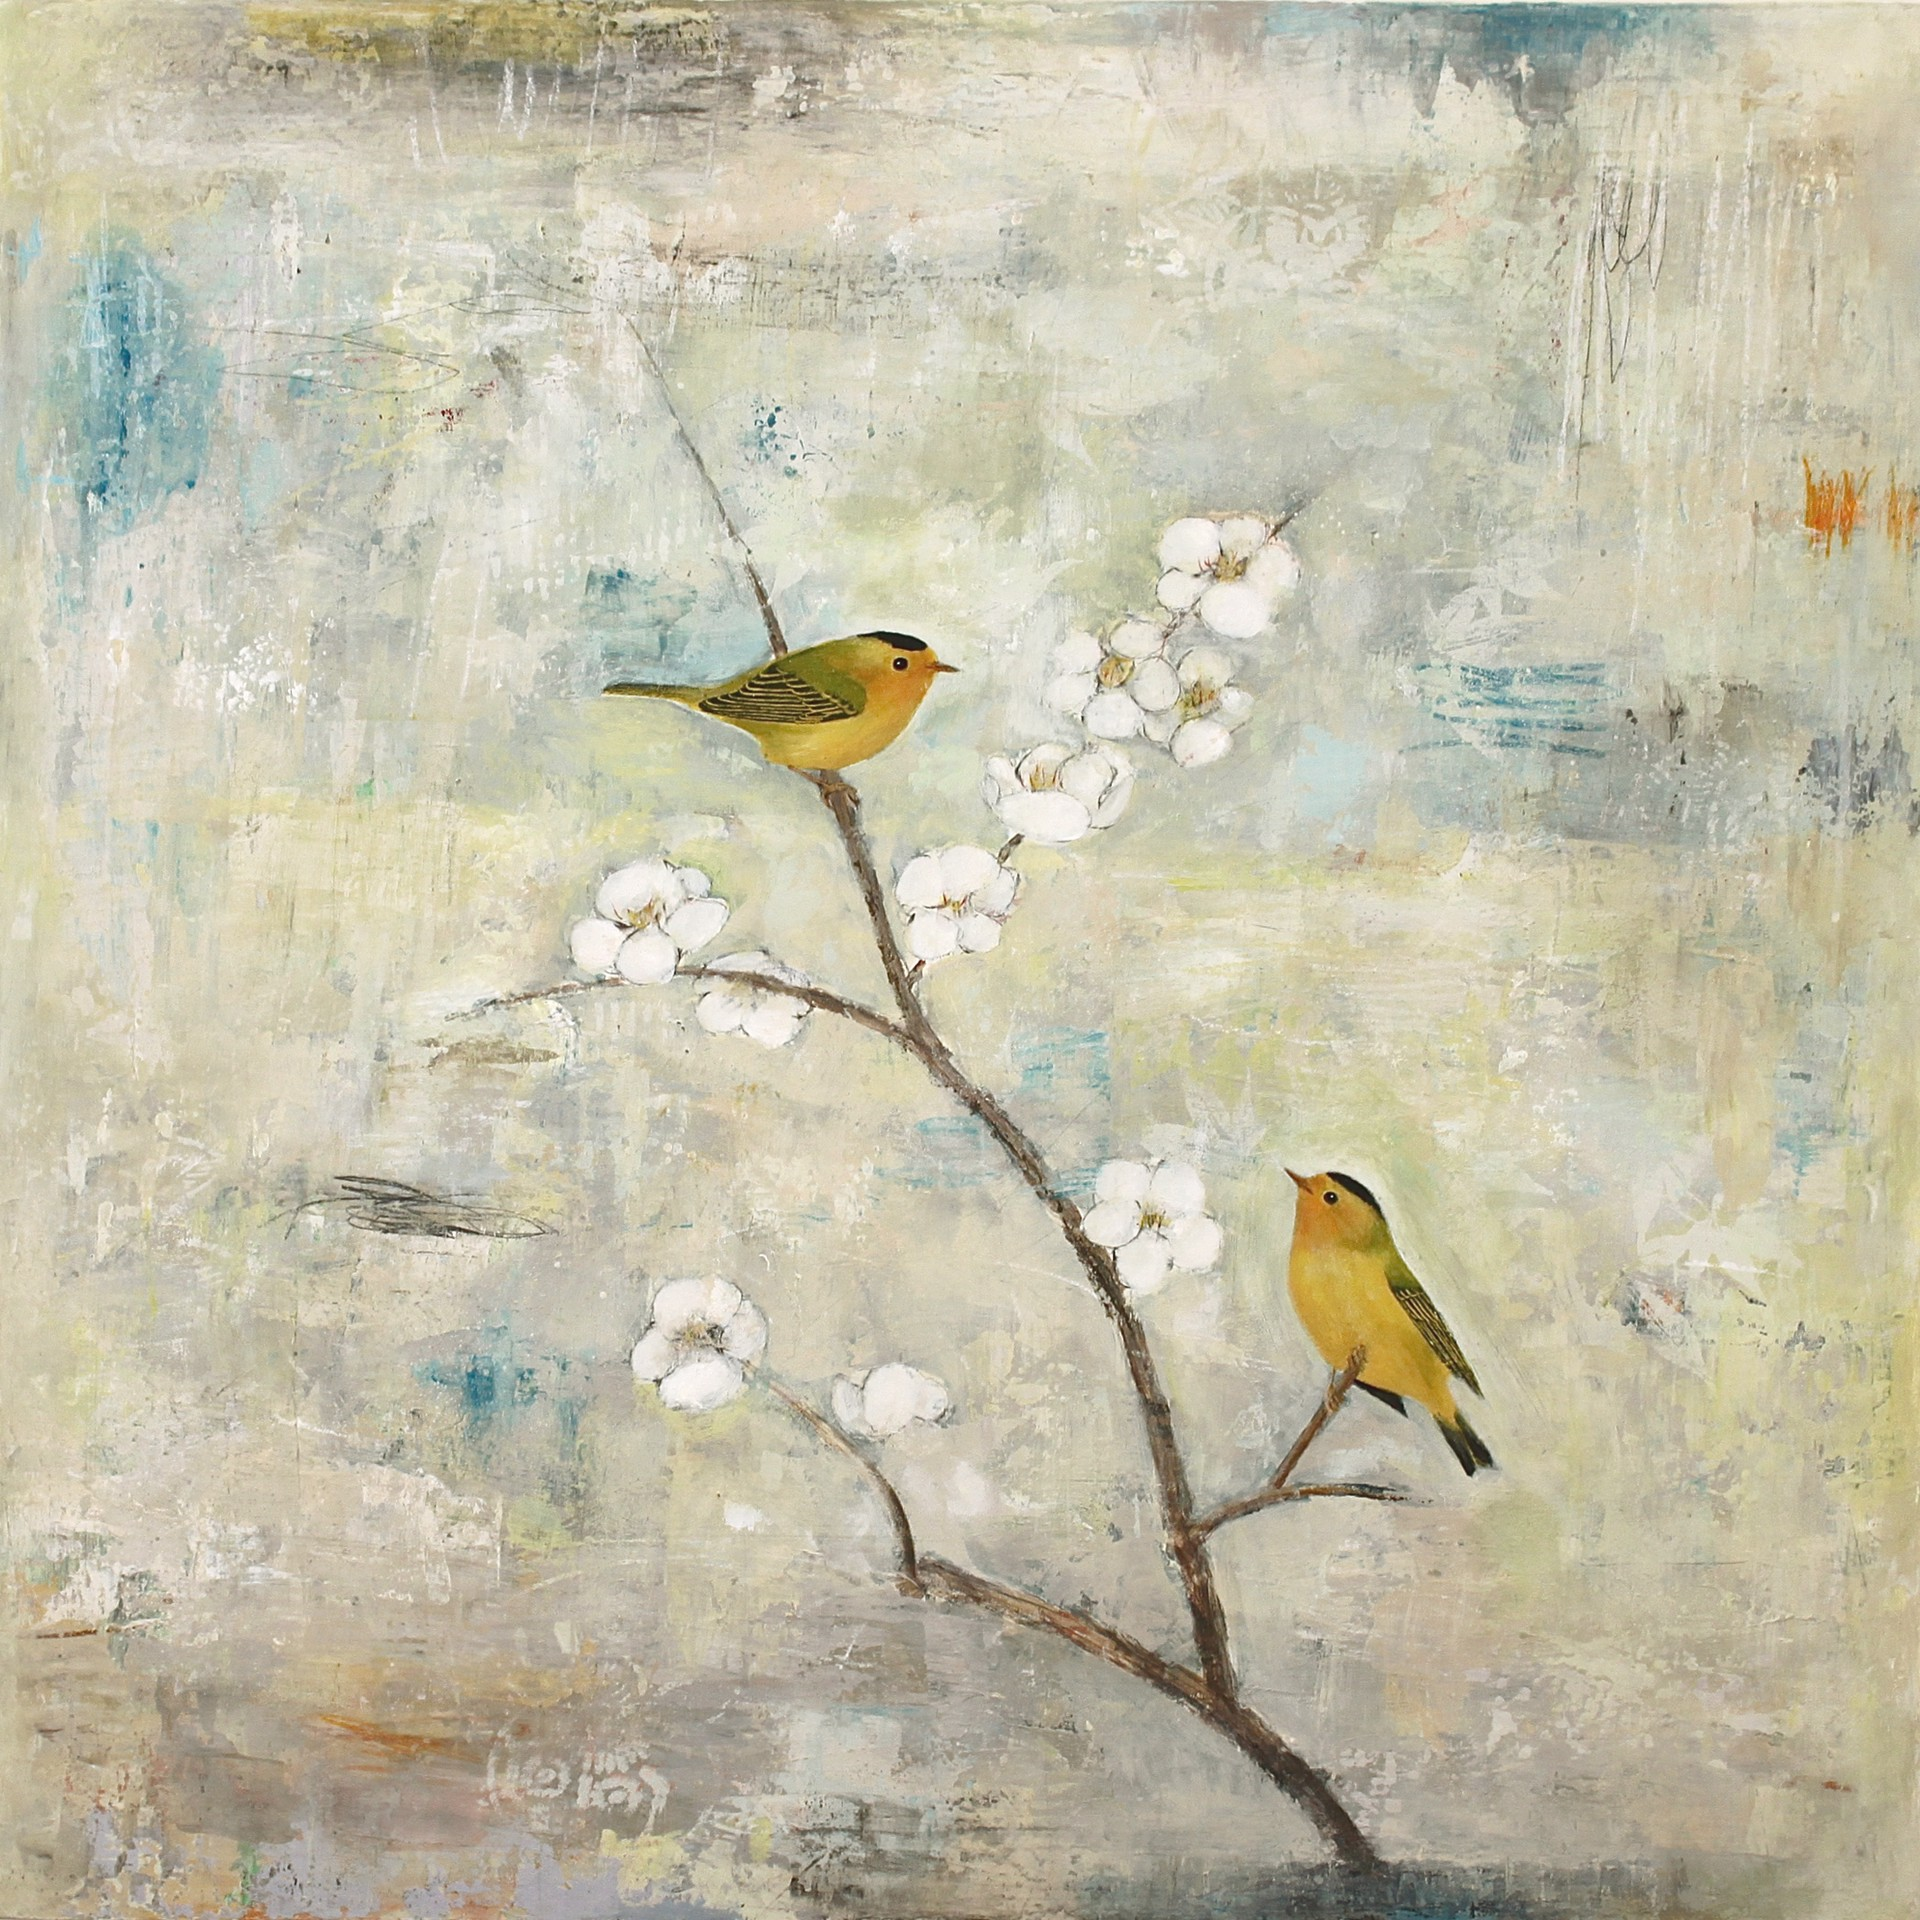 Radiant Spring by Paul Brigham